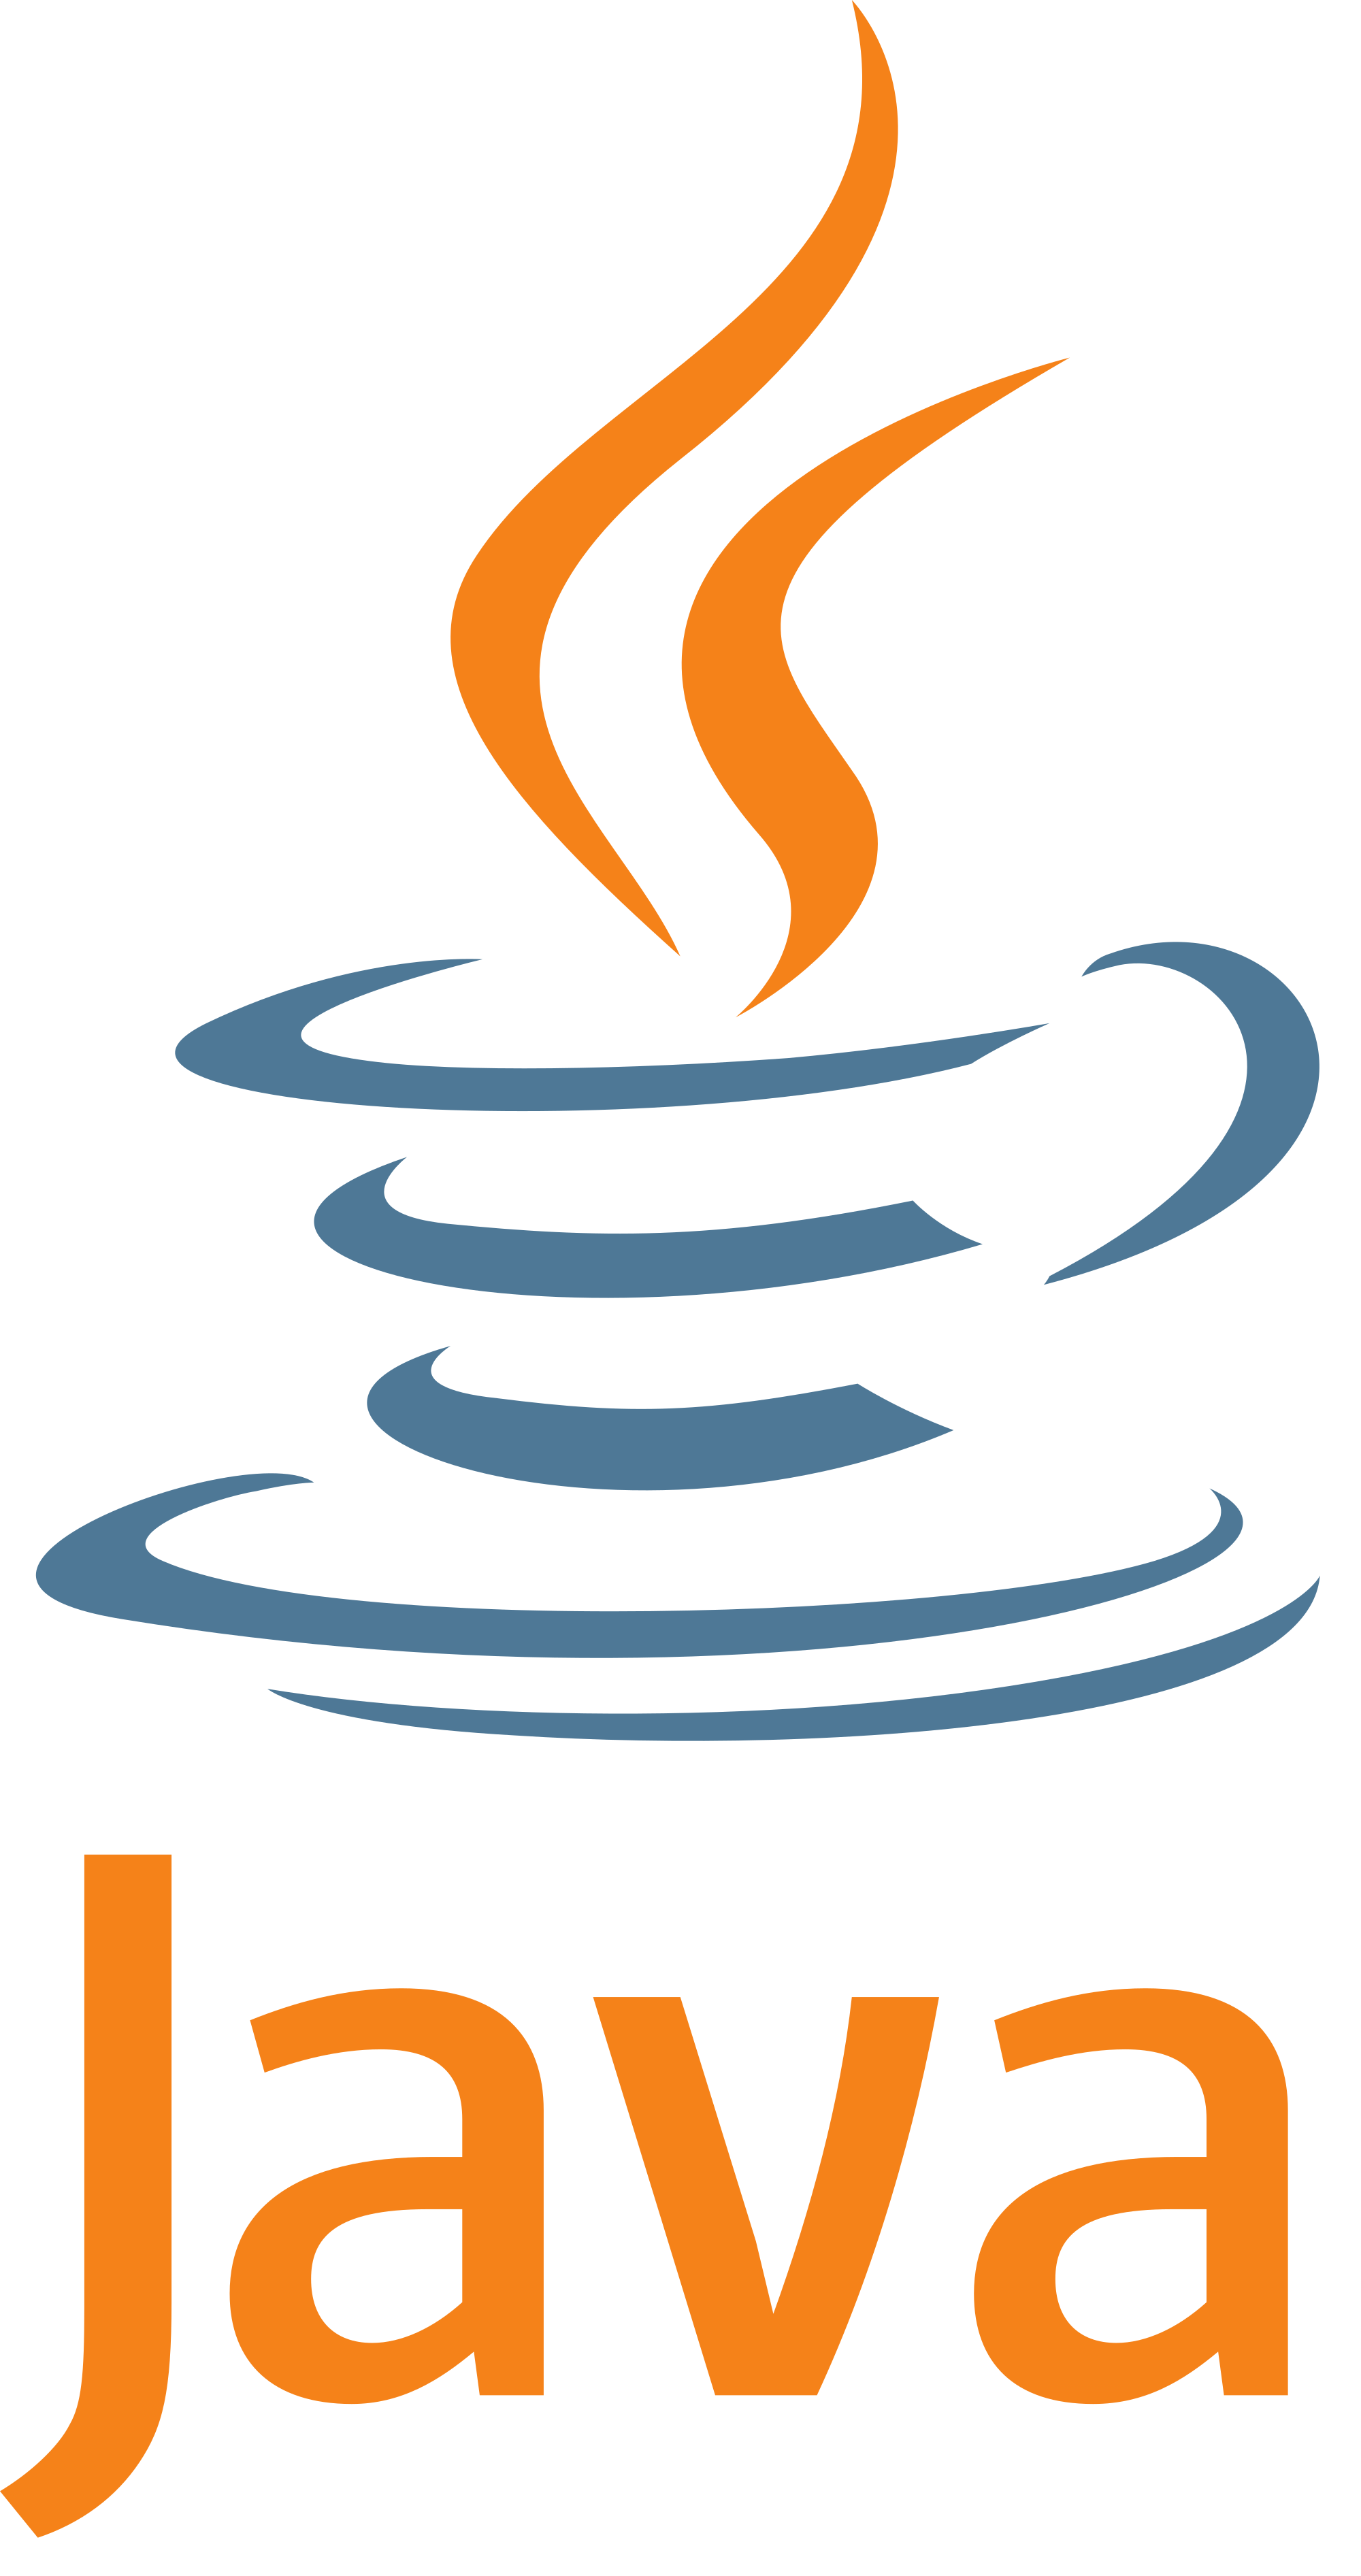 Java 11 kompakt für Java-Programmierer Logo